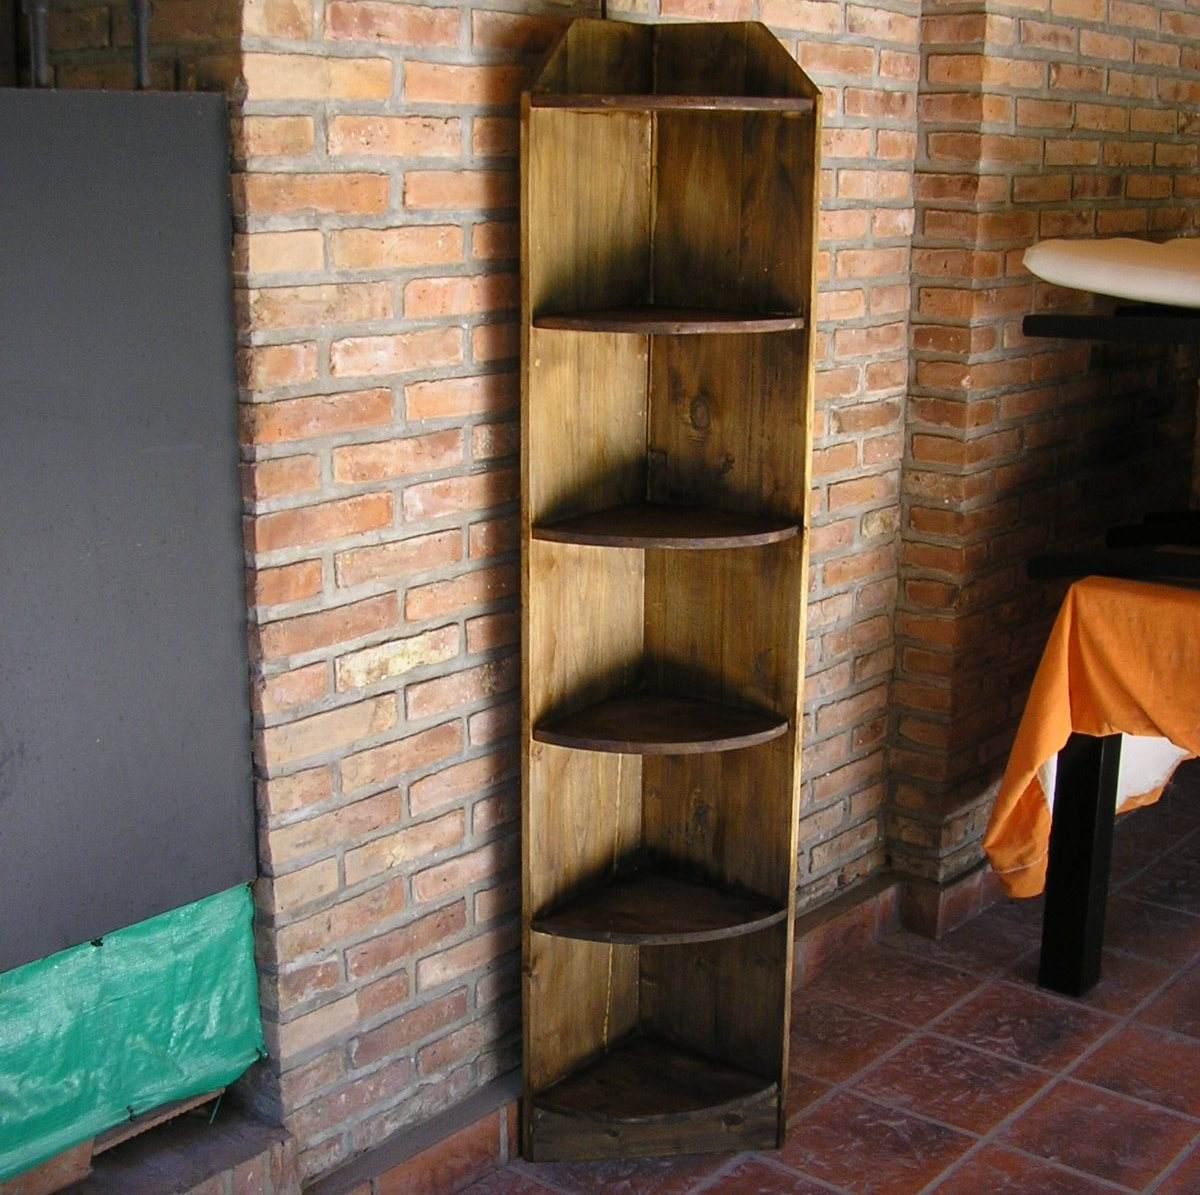 Muebles esquineros sobuy estantes esquineros estanterias for Muebles de cocina esquineros